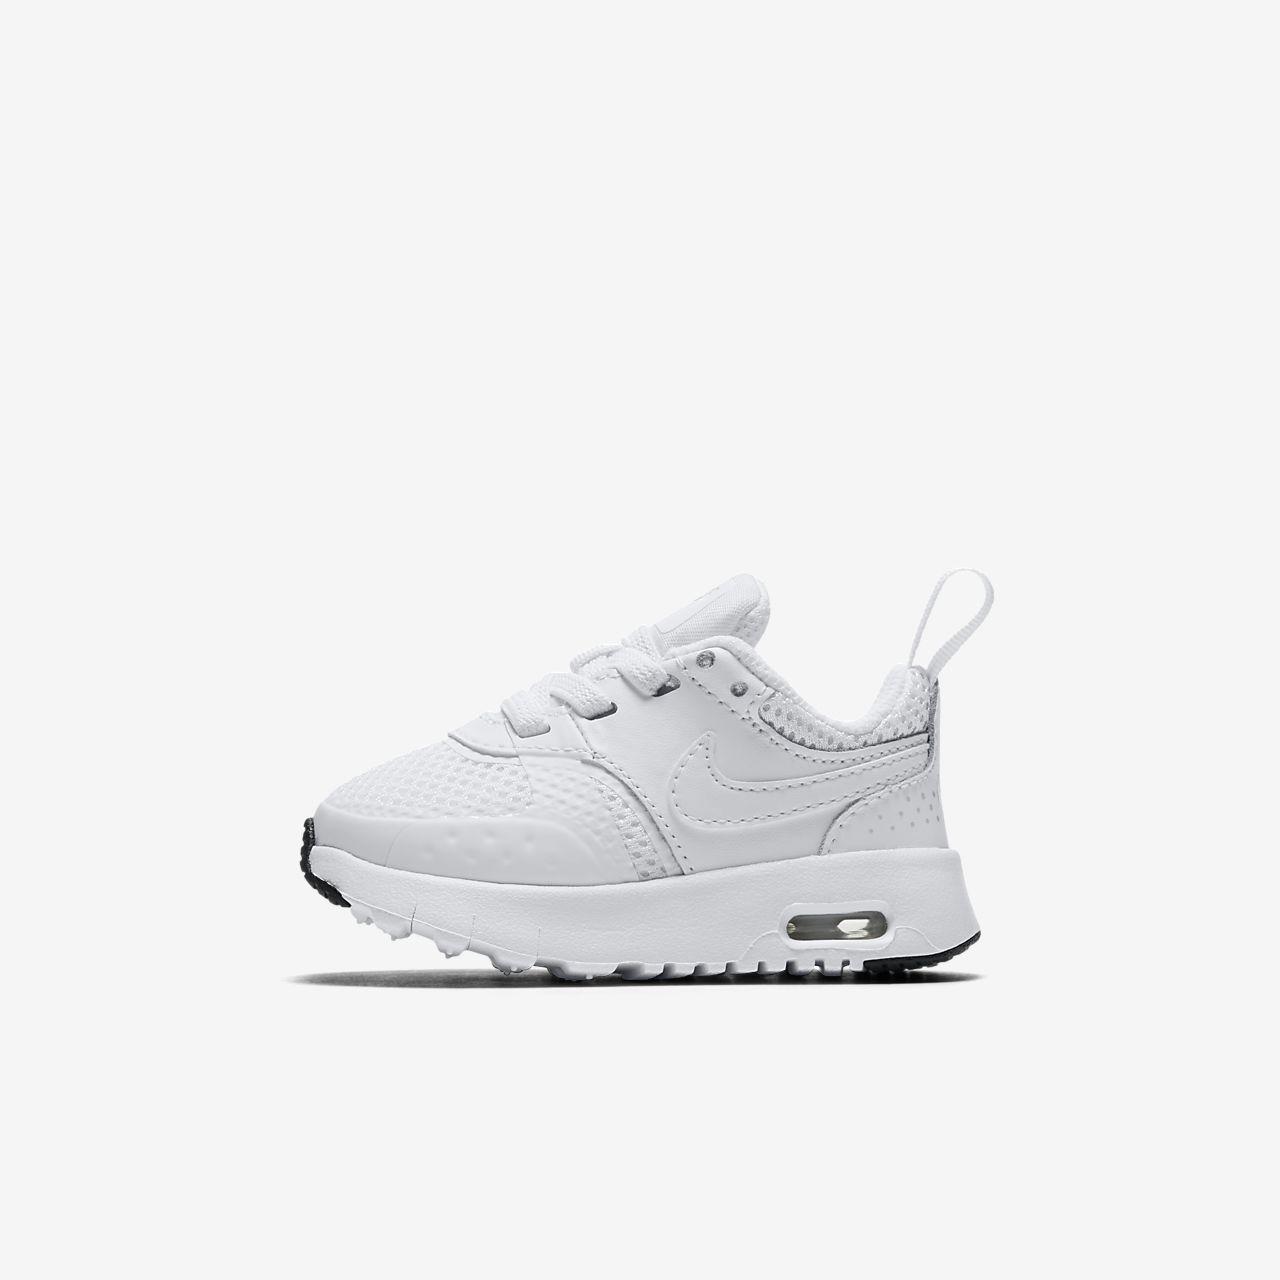 lacci scarpe nike air max bimbi